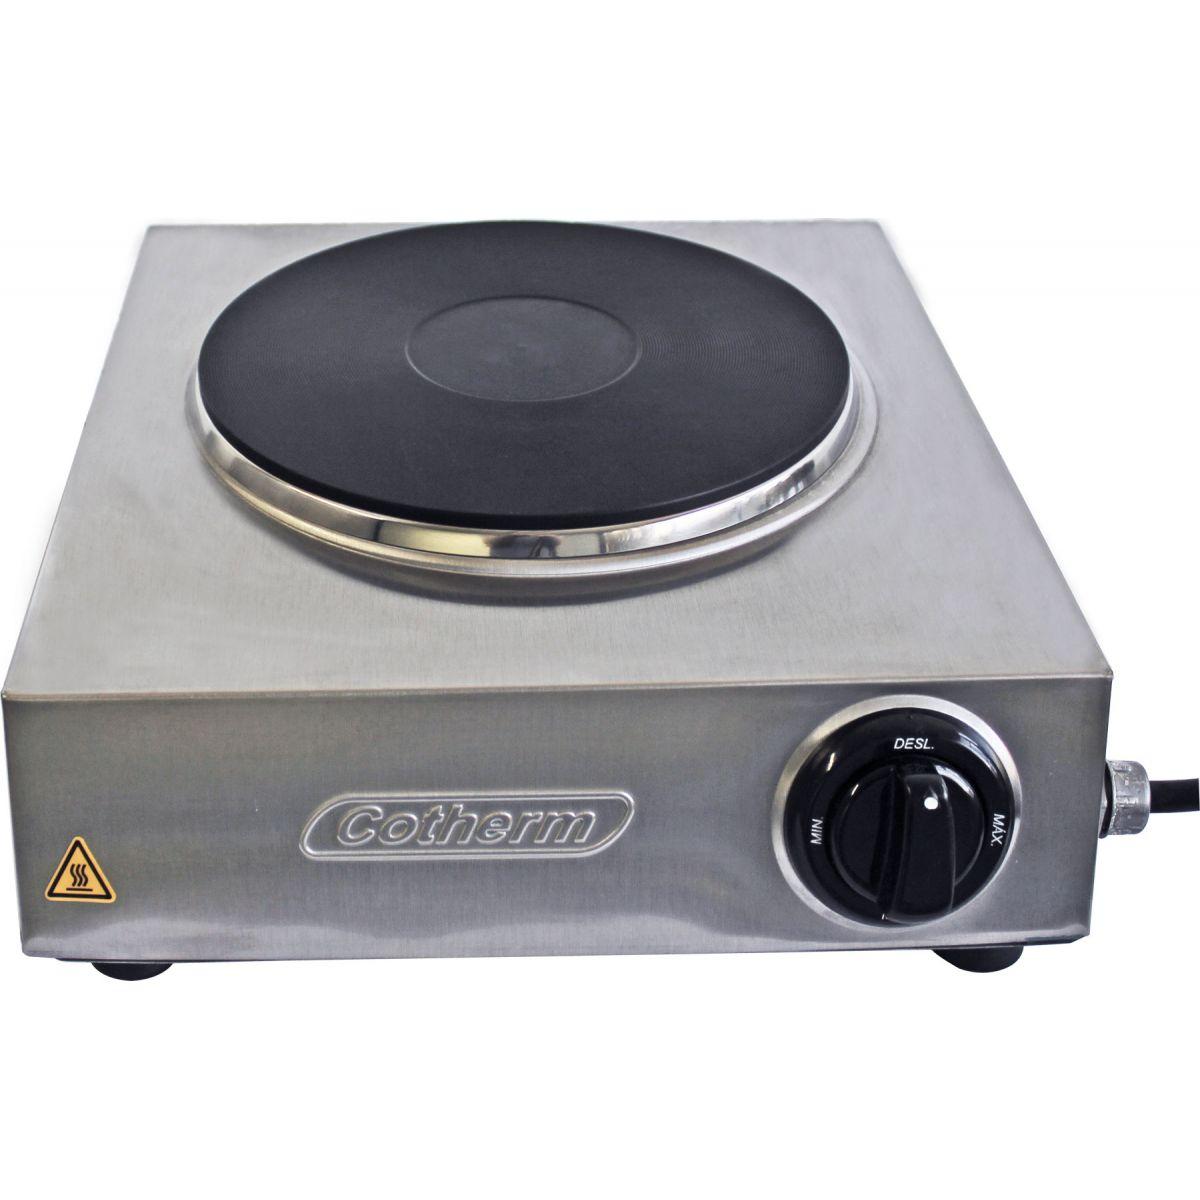 Hot Plate Profissional Topazio 1 Boca 2500W  - Topcom Eletro